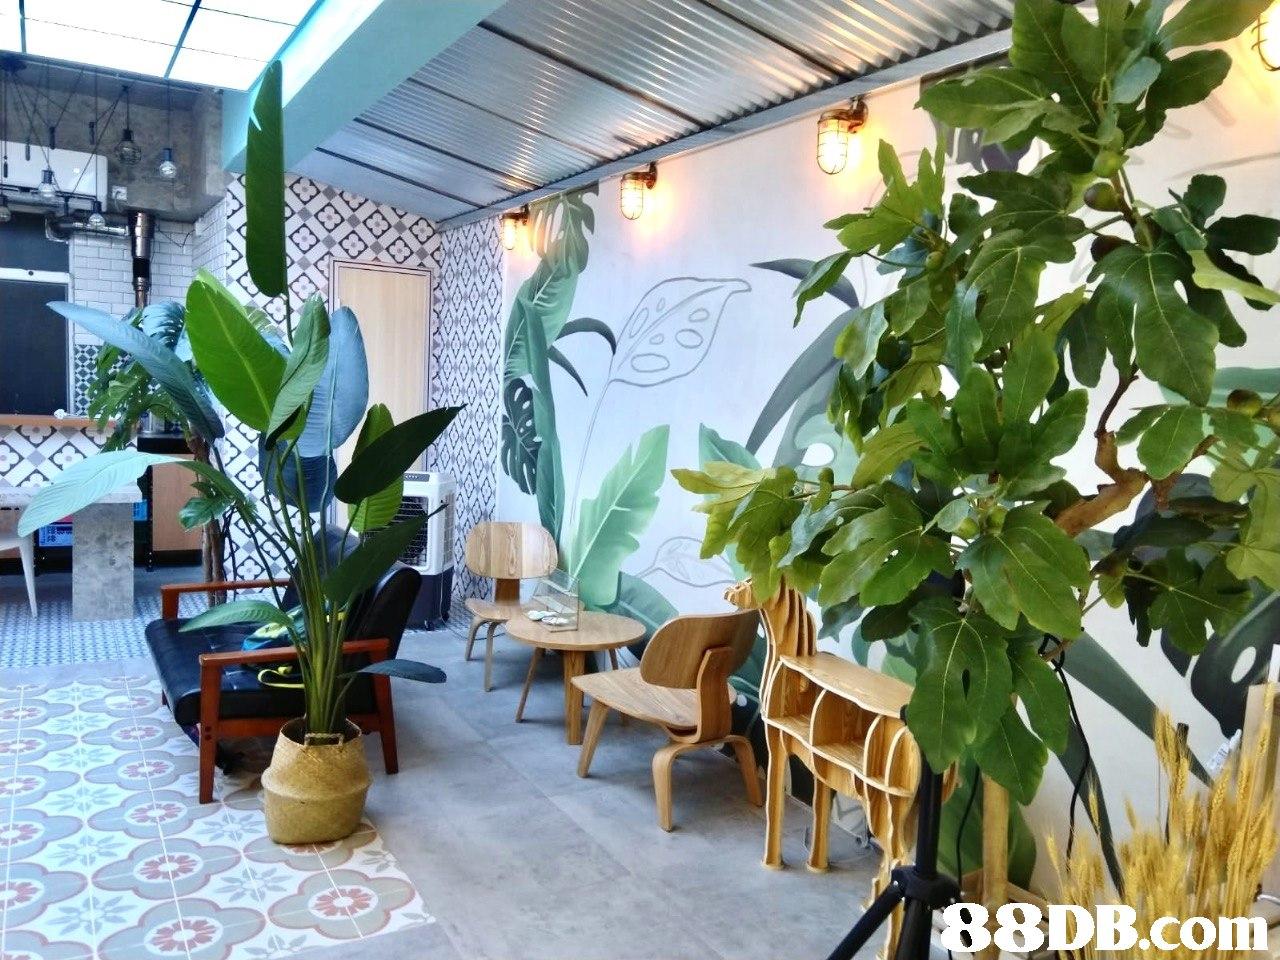 2 B8DB.com  plant,flora,real estate,leisure,interior design